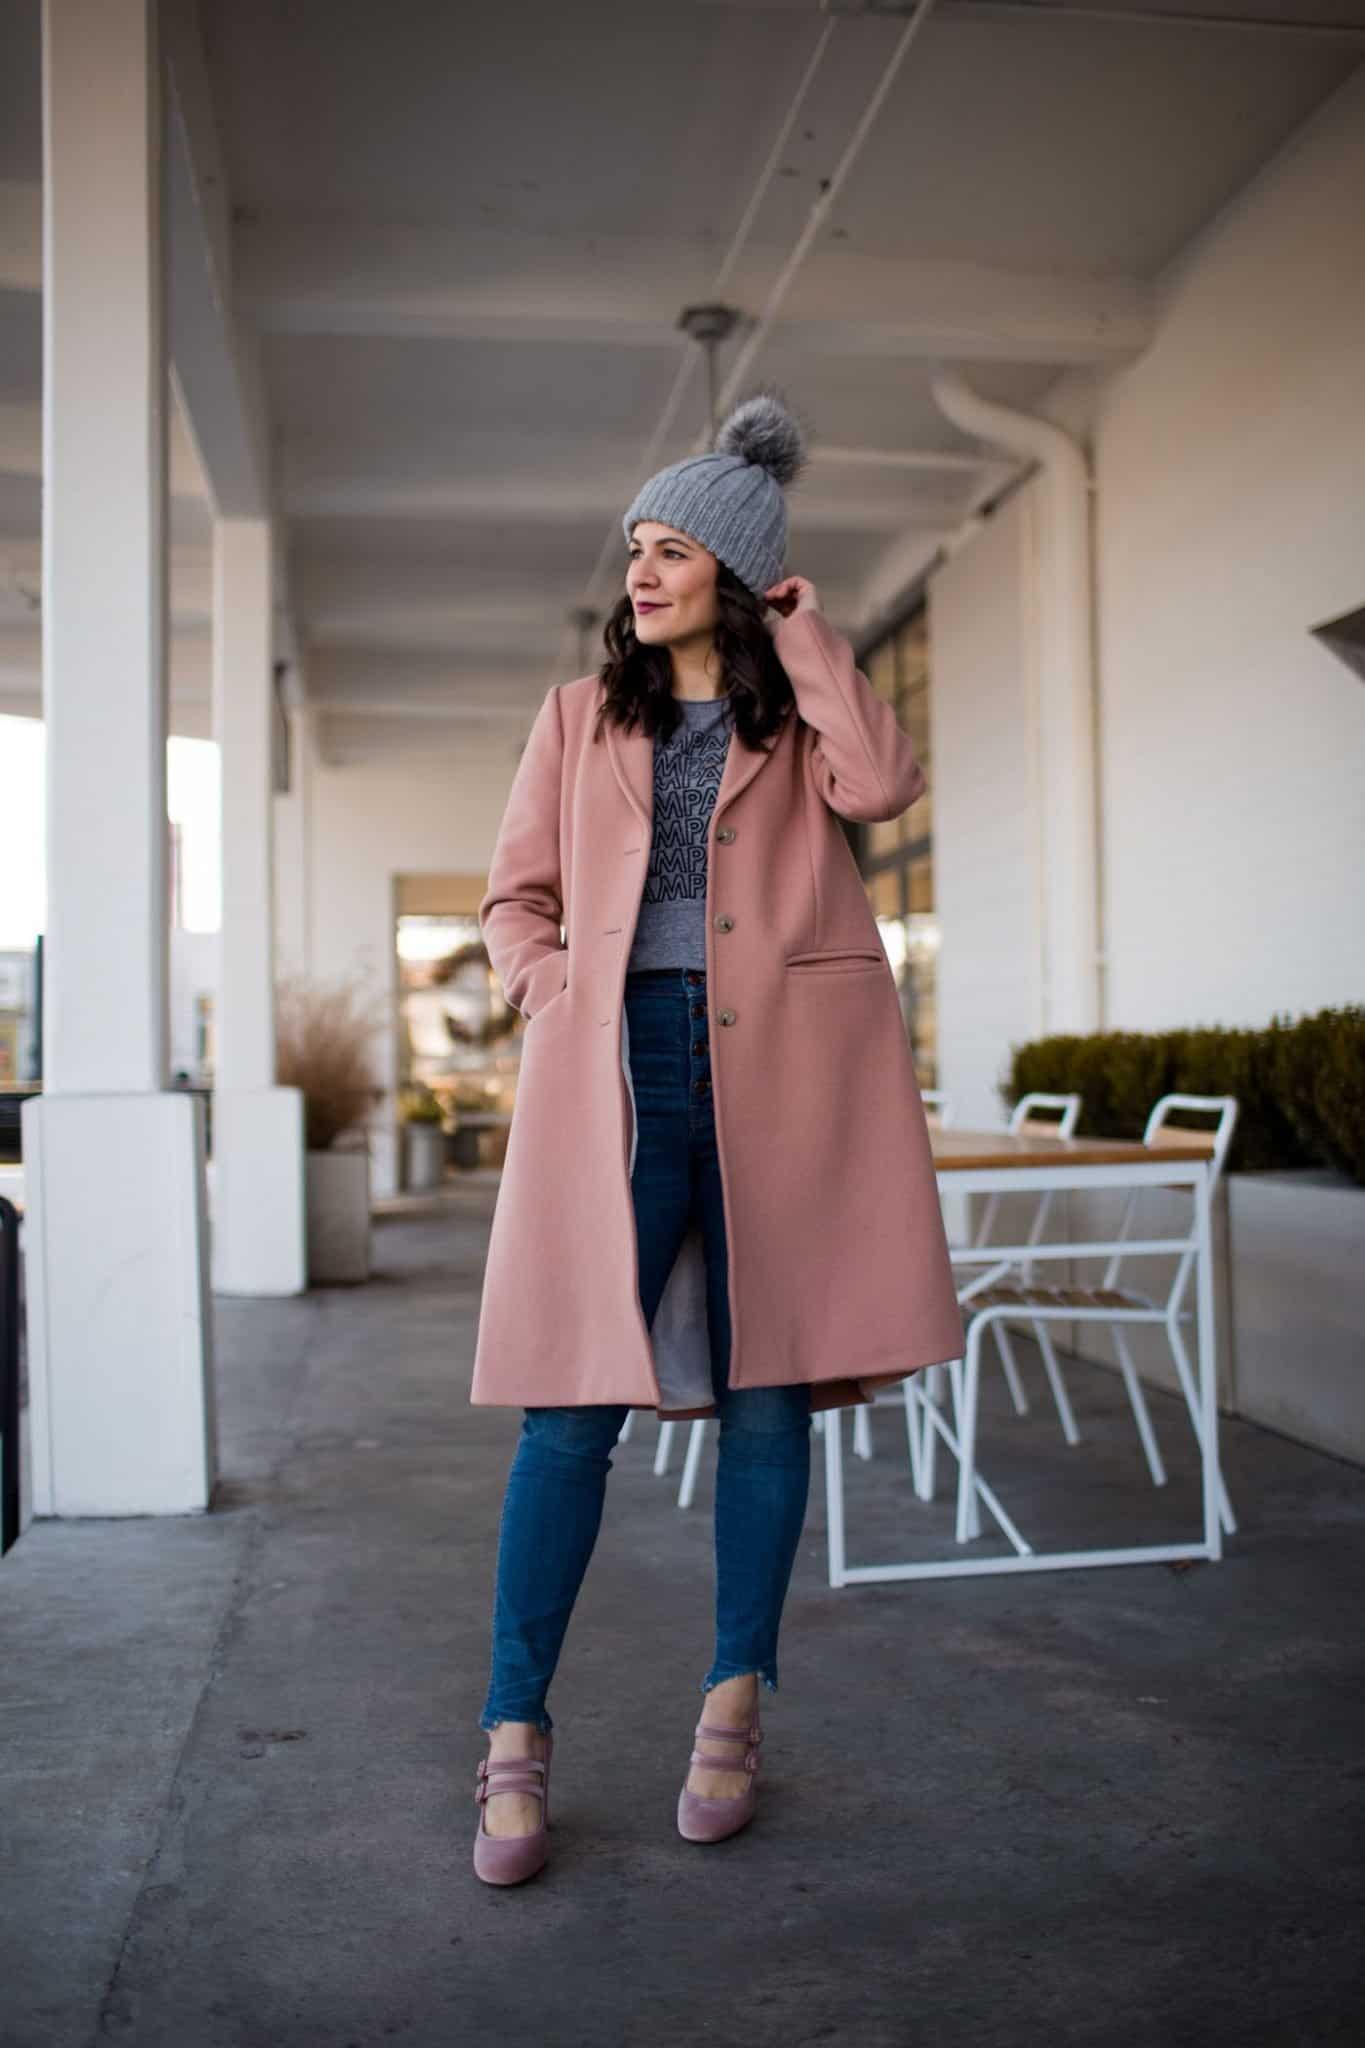 pink winter coat, cute winter outfits - My Style Vita @mystylevita